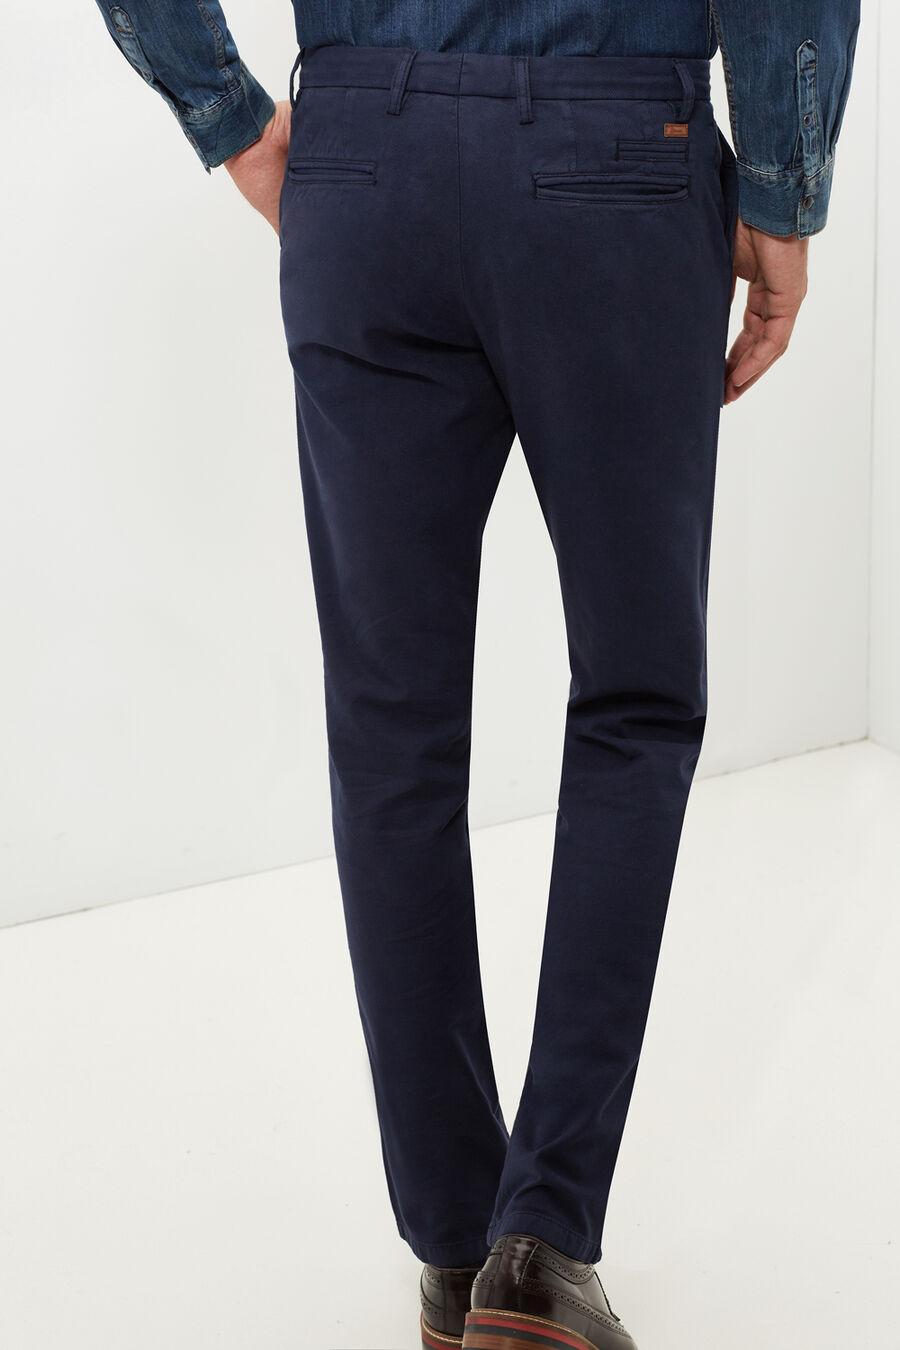 Pantalón chino tailored fit